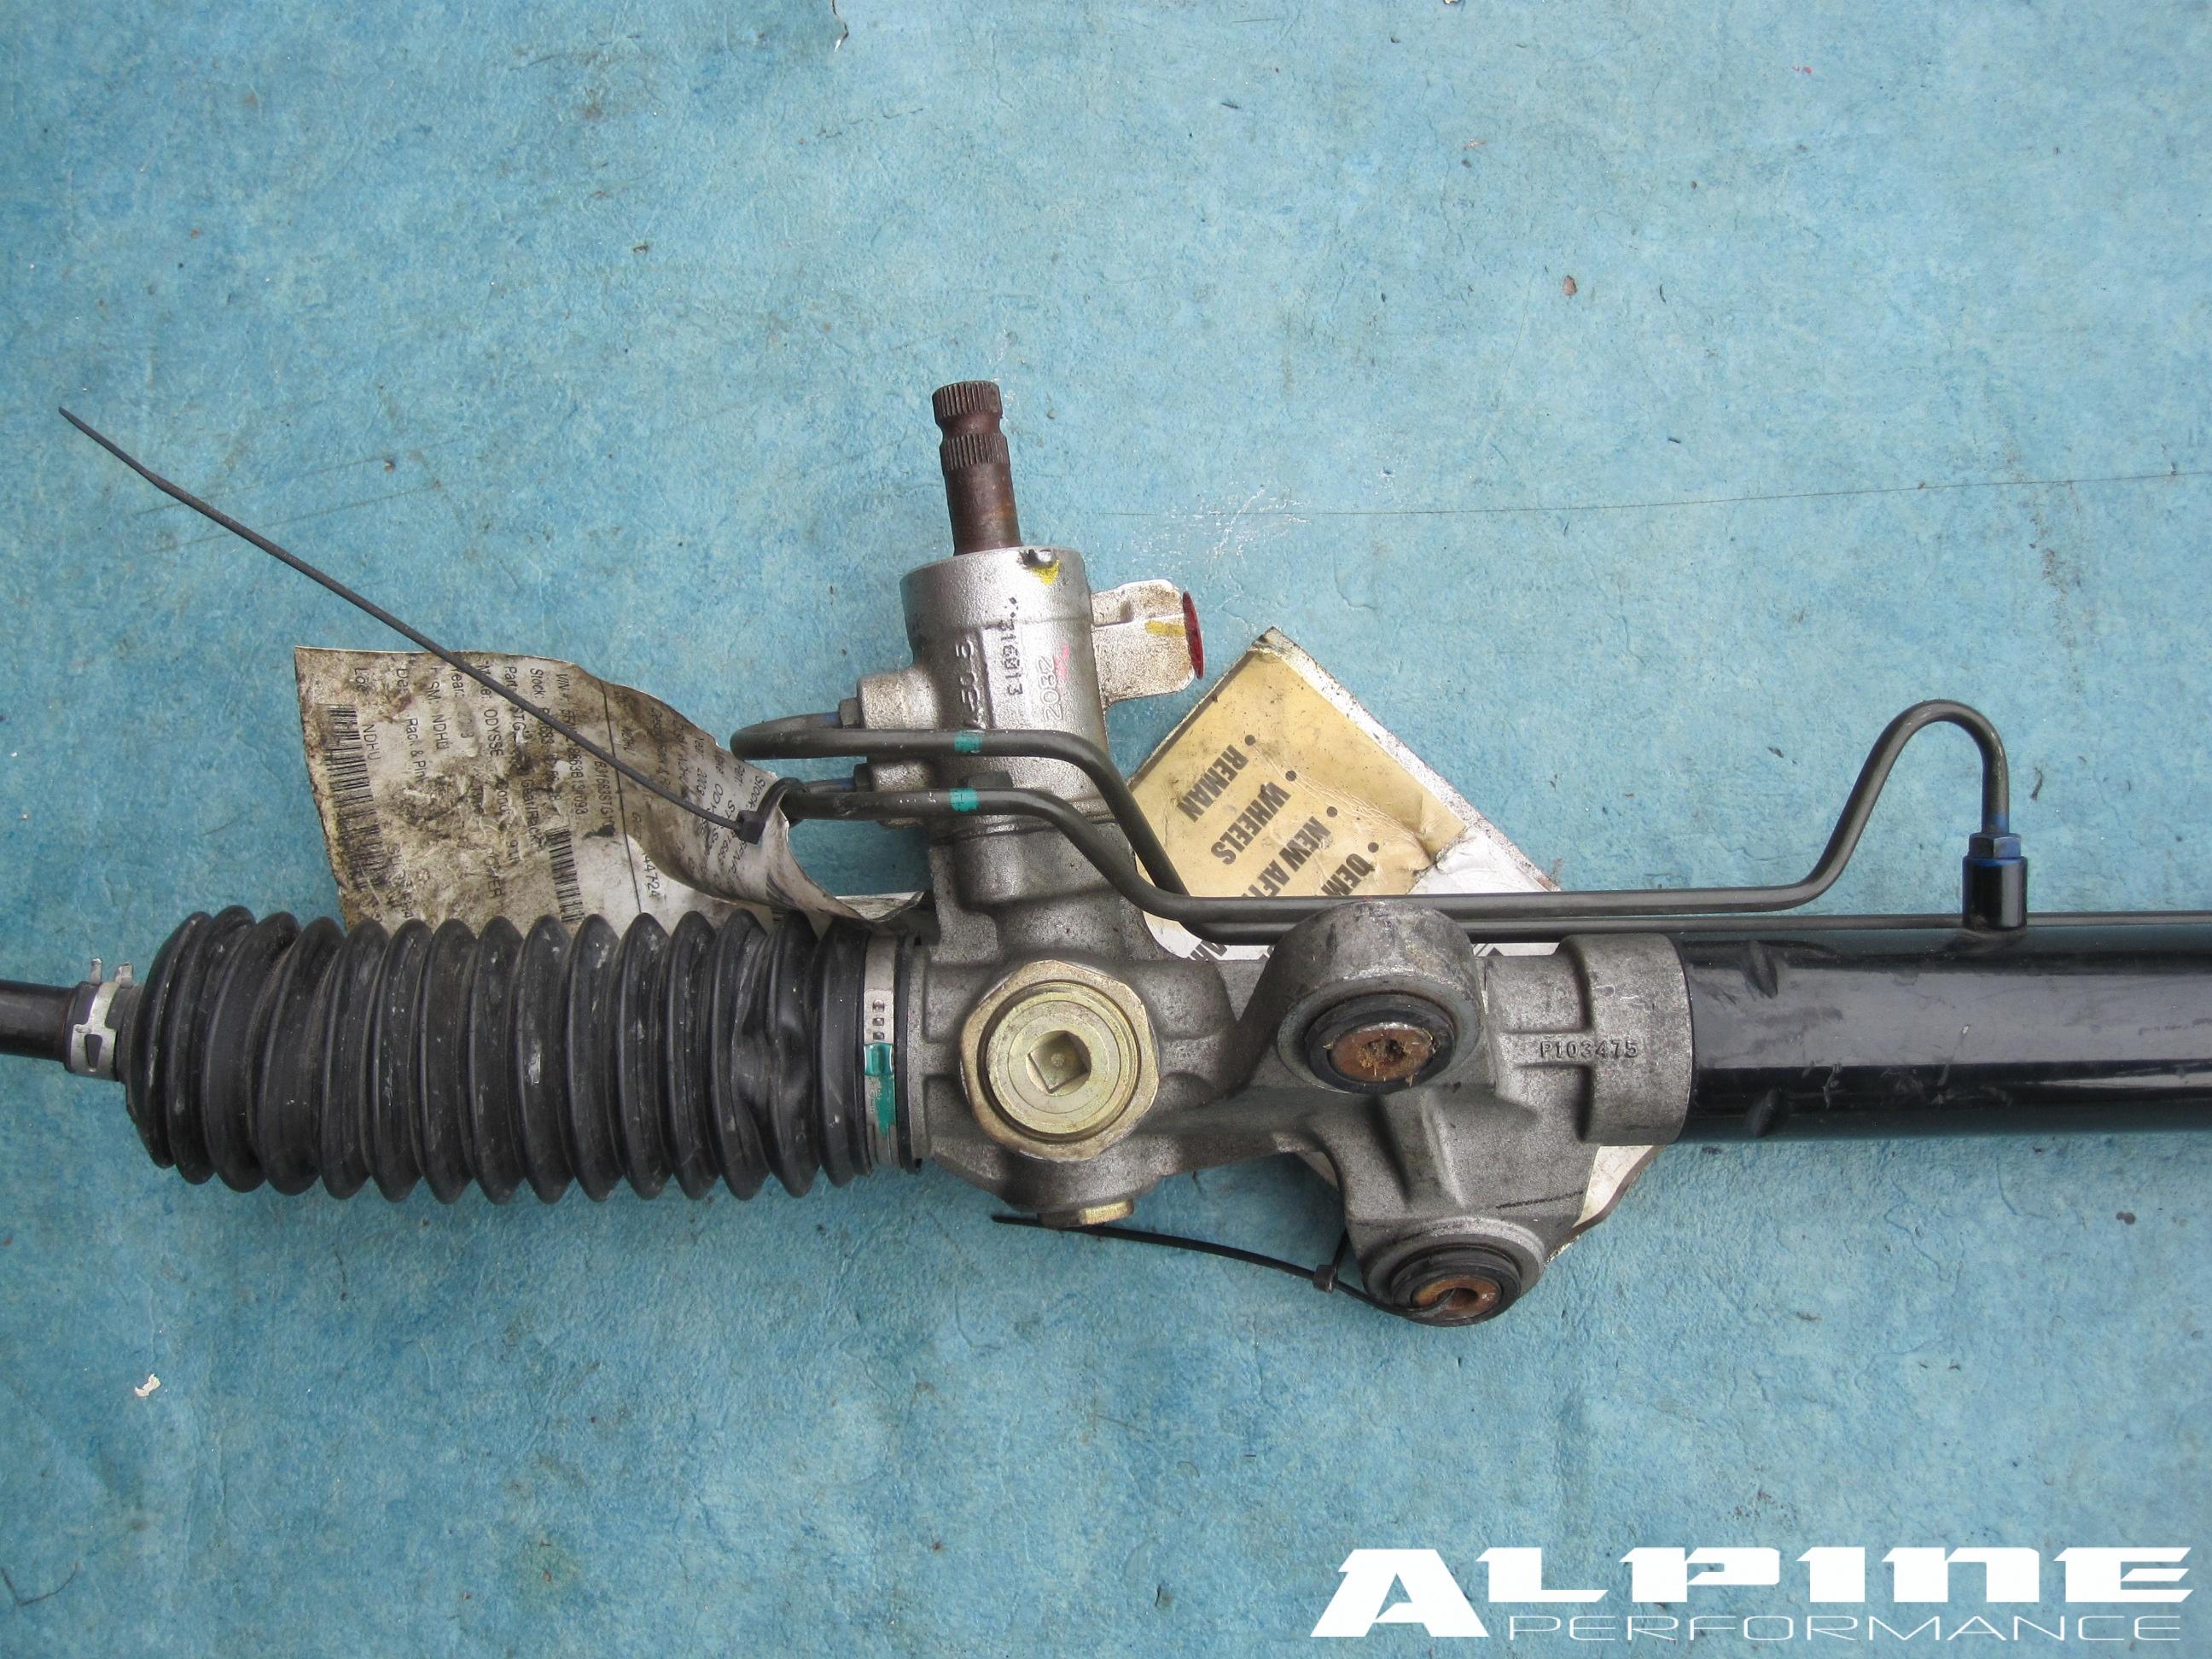 Origianal Honda Odyssey Rack And Pinion Oem Parts 2003 Headlight Wiring